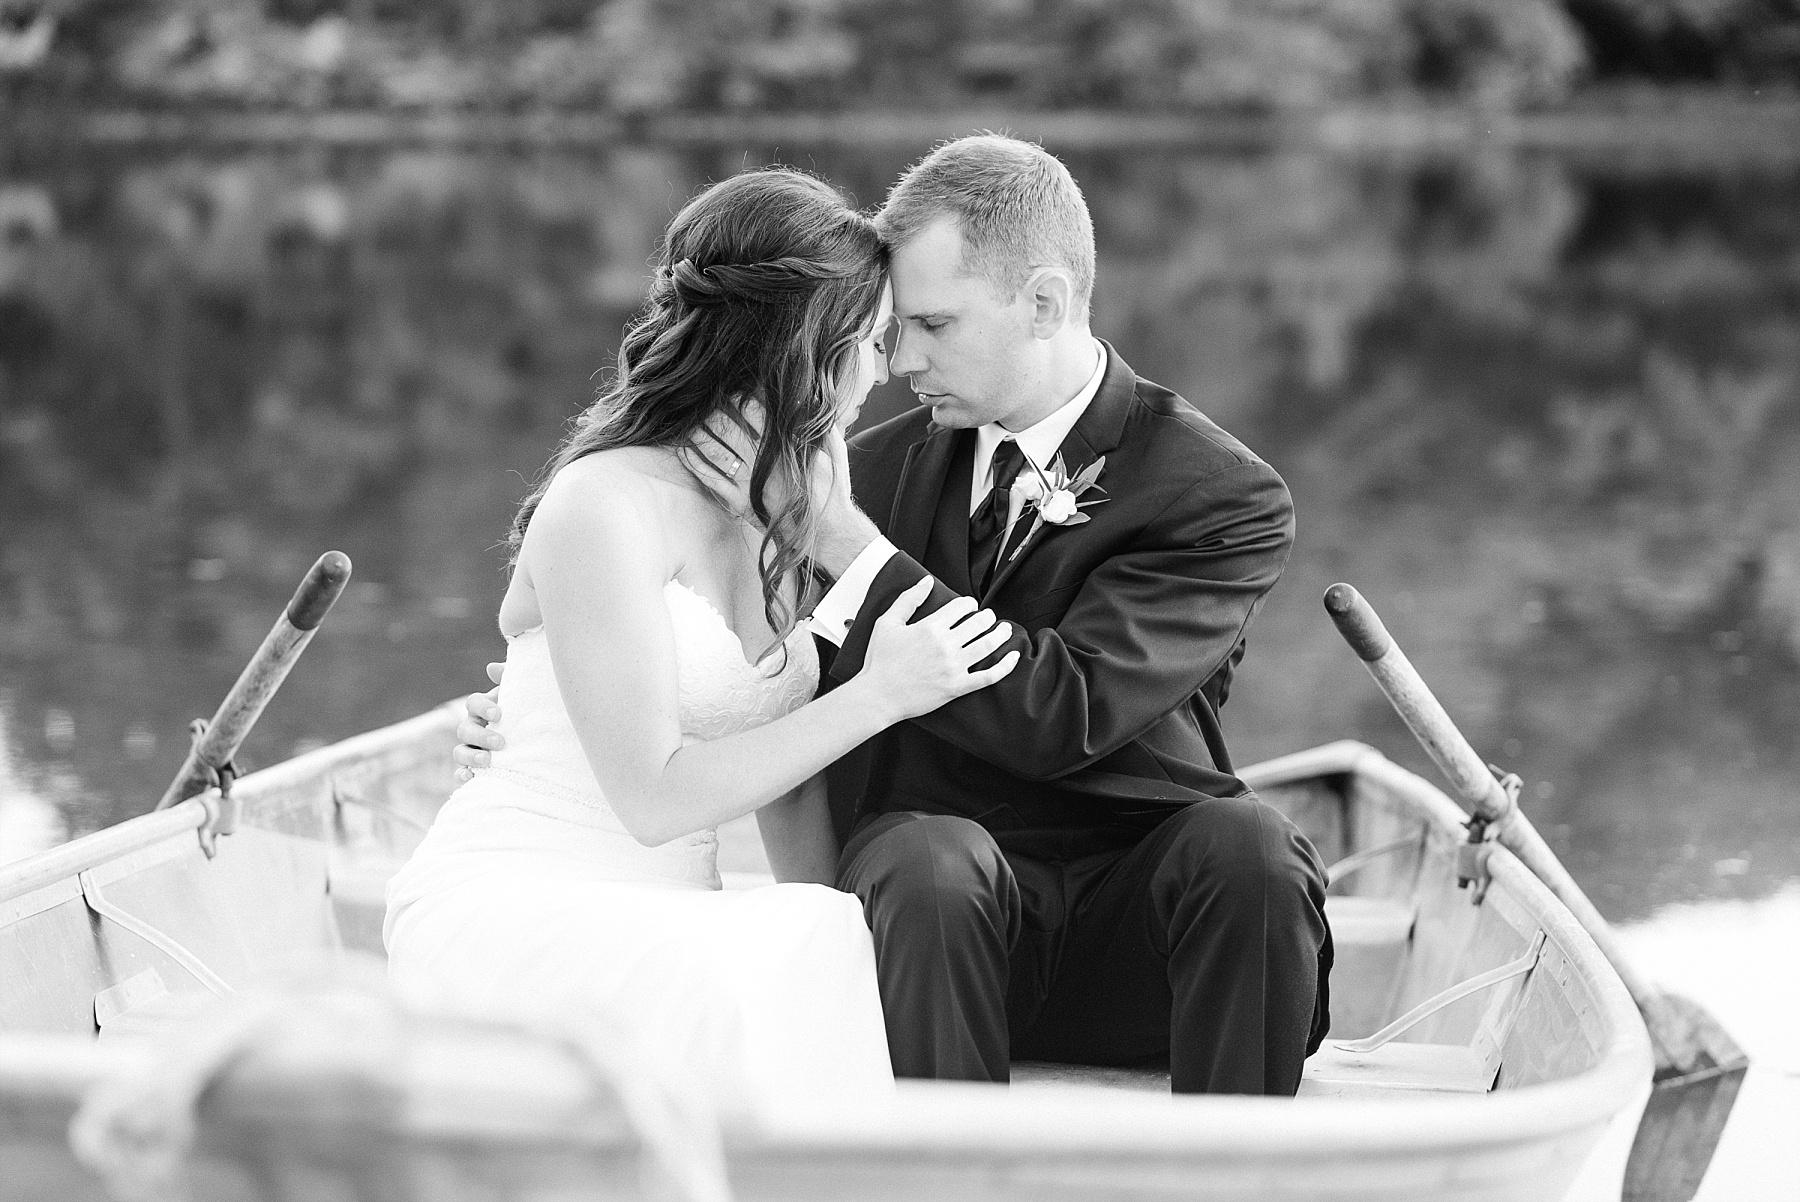 Romantic Summer Sunset Wedding Ceremony at Little Piney Lodge St. Louis Missouri by Kelsi Kliethermes Photography Fine Art Photographer_0019.jpg